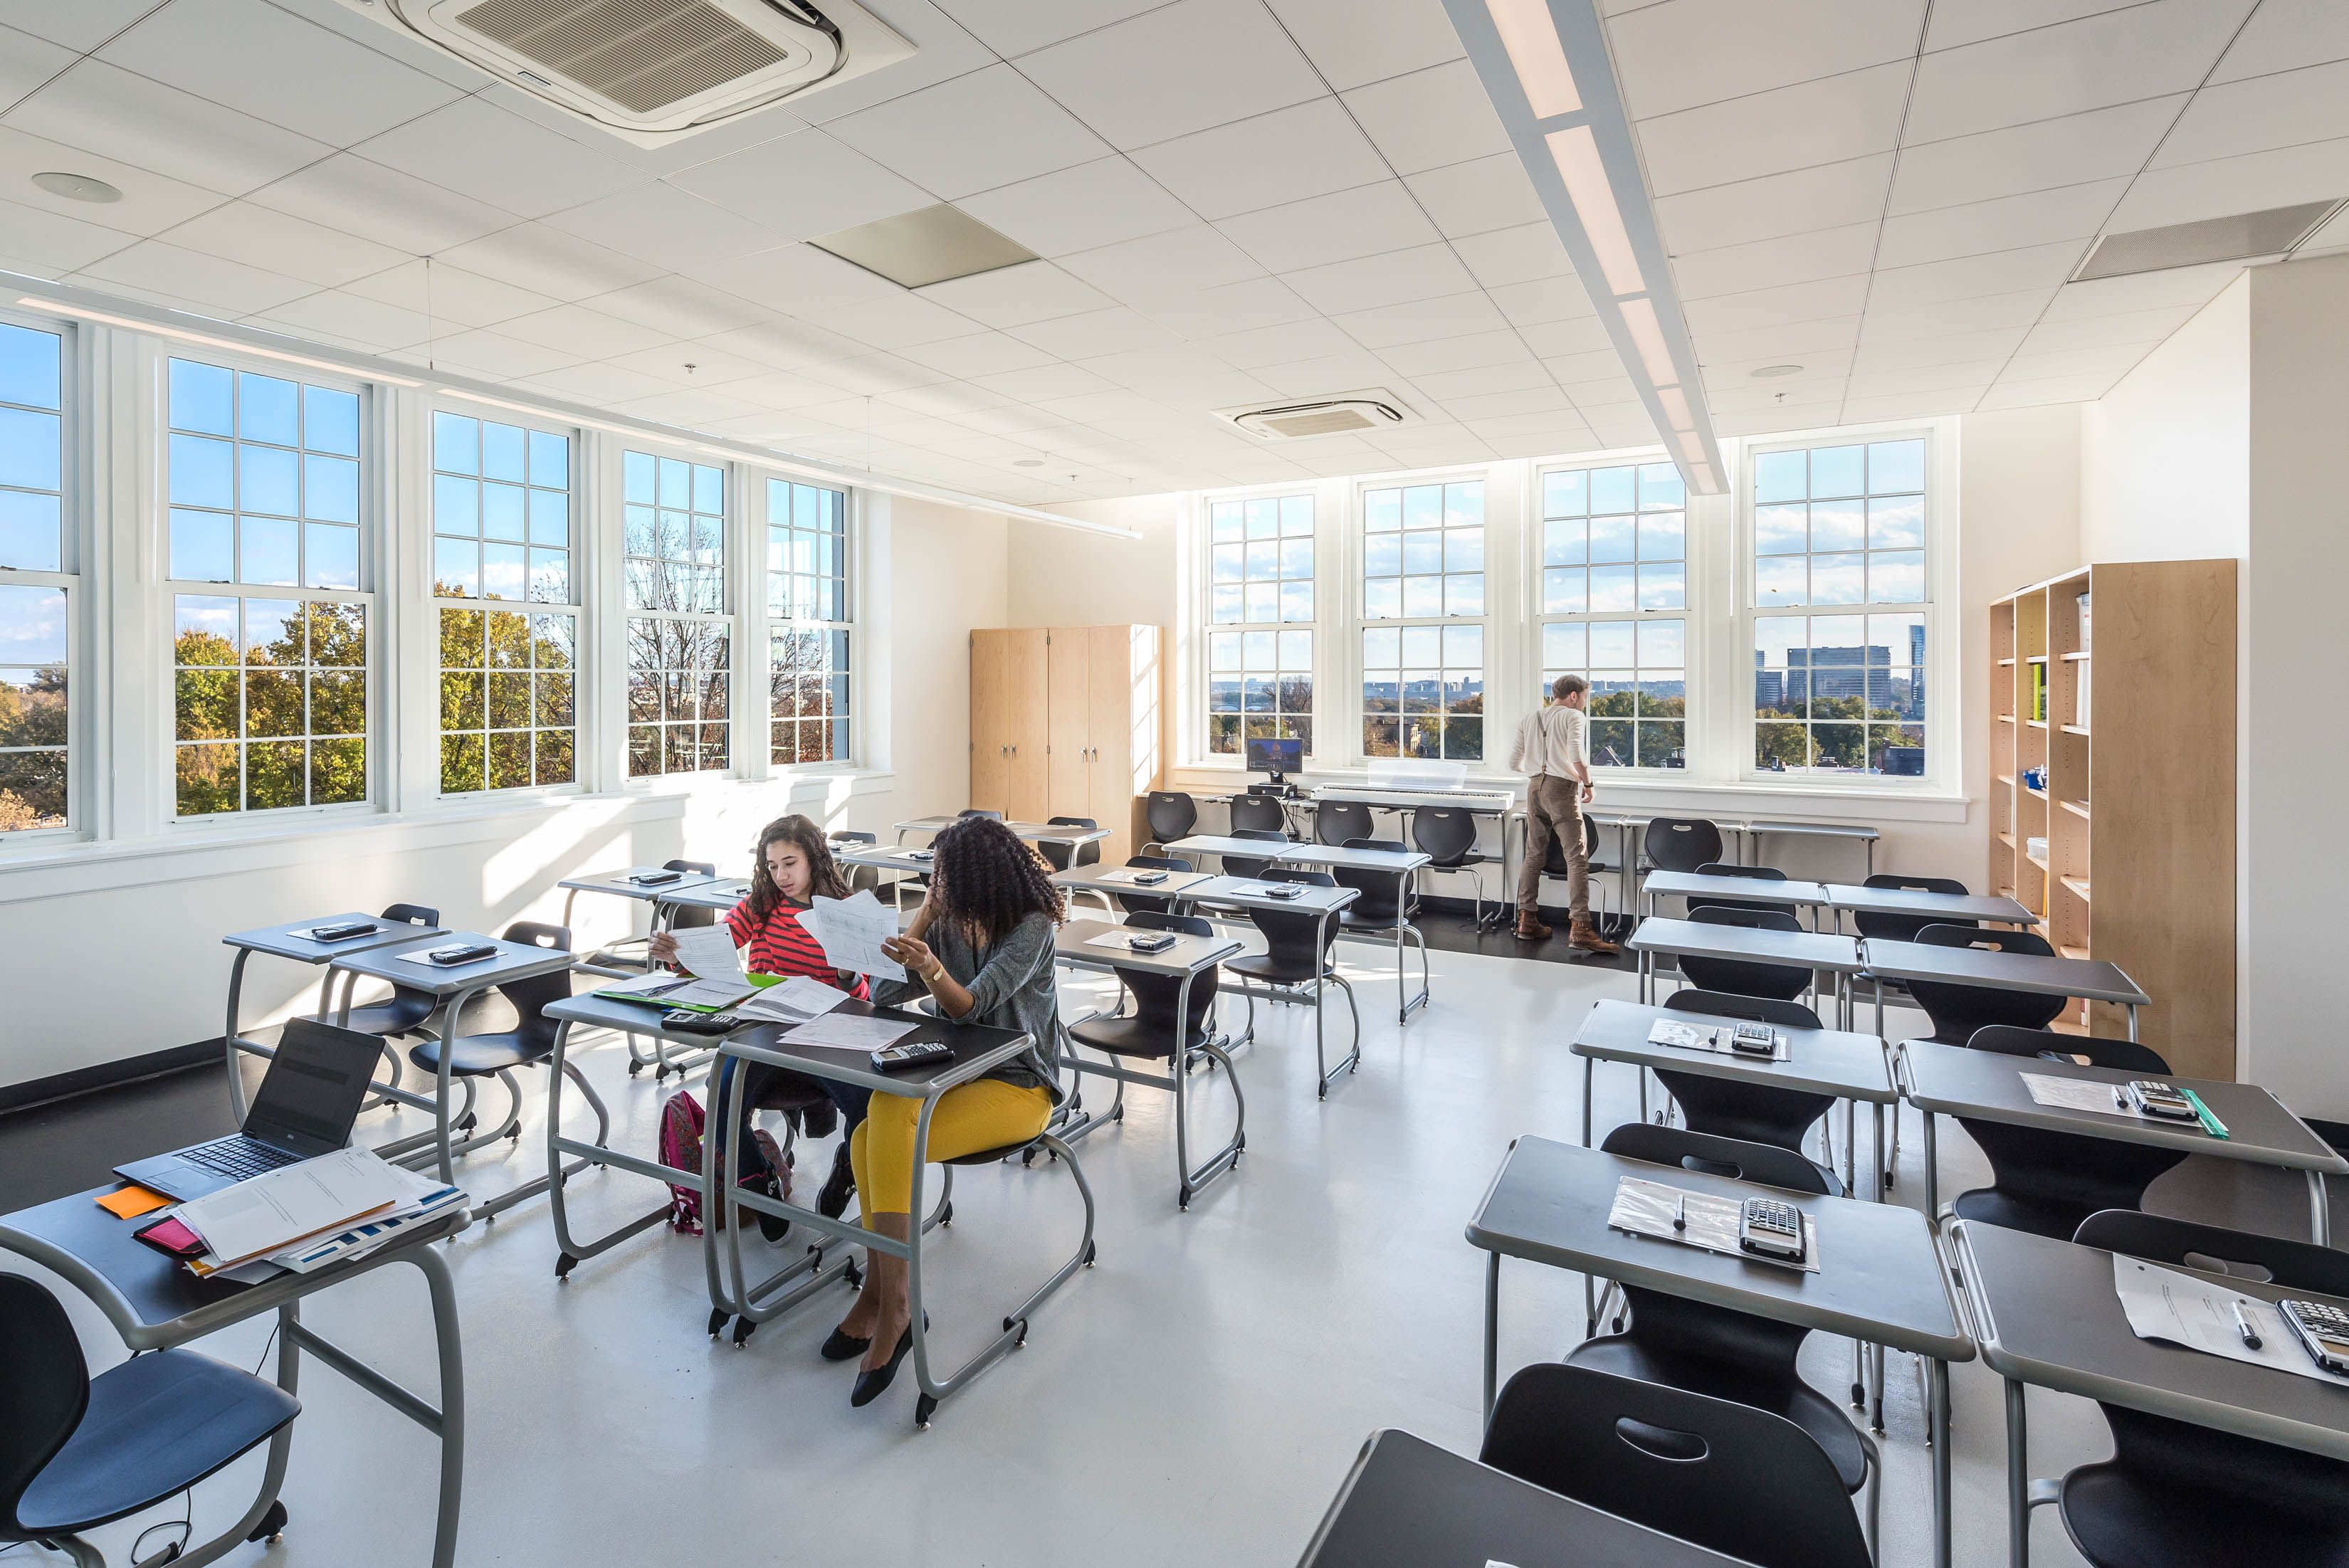 Illuminate Classroom Spaces With Crisp Indoor Lighting For A Better Learning Environment Indoor Design College Architecture Indoor Lighting Fixtures